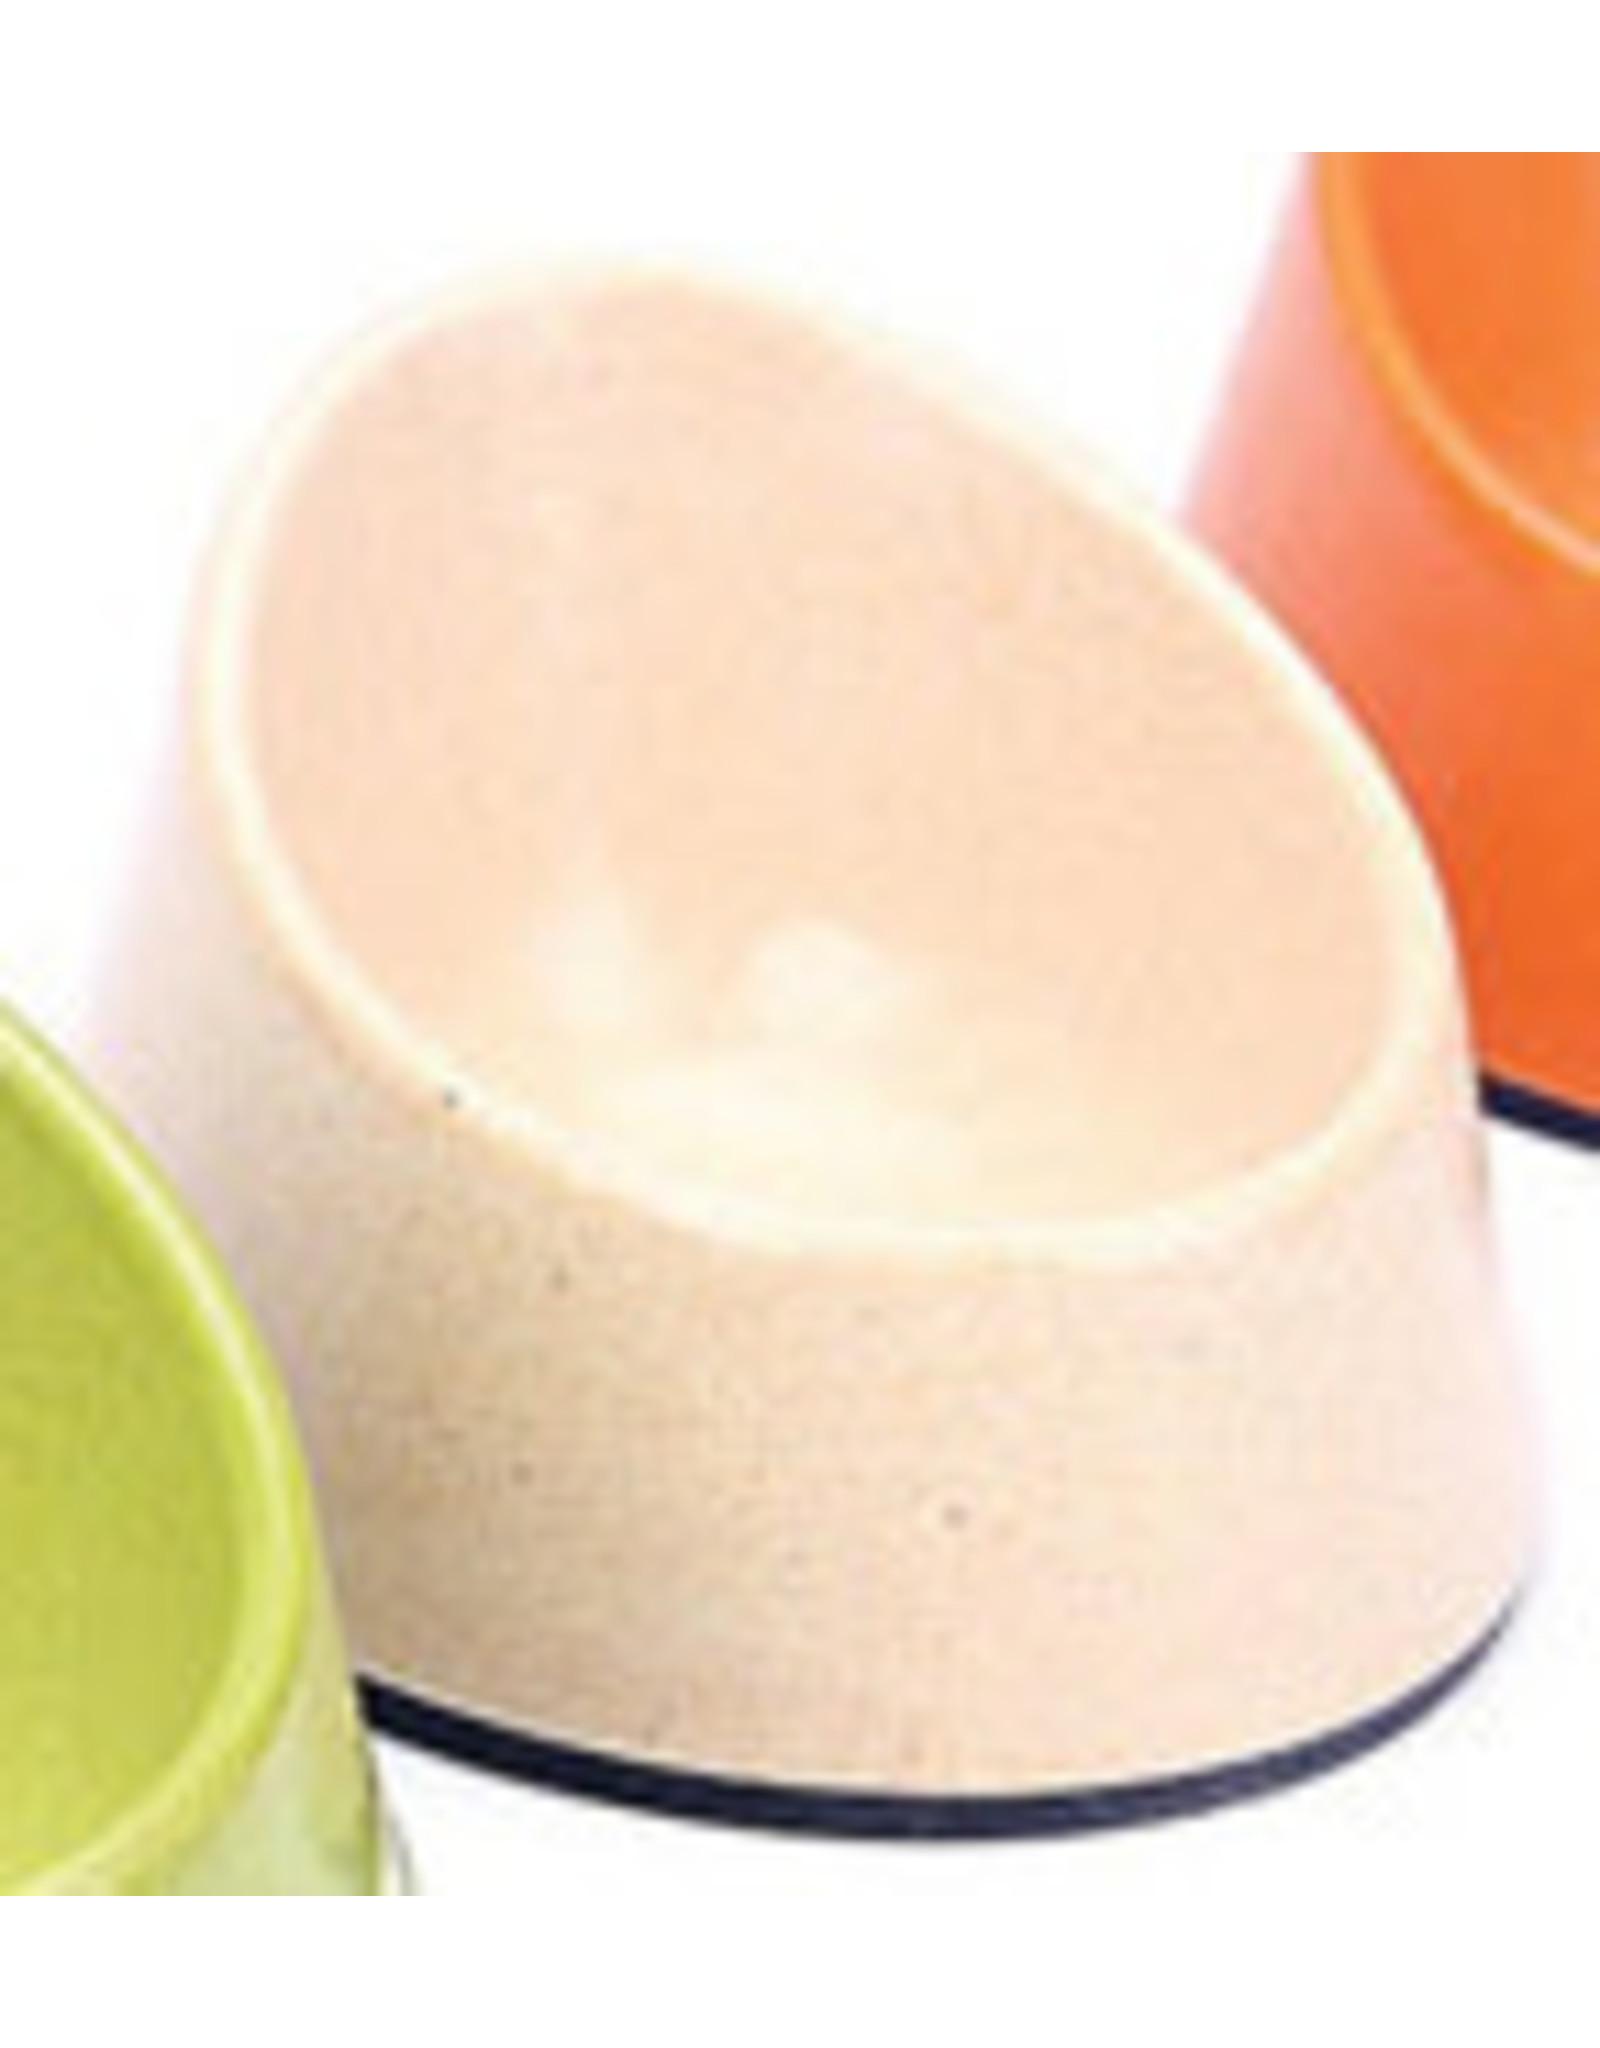 DefinePlanet DP Bamboo Bowl HiBack - Ivory